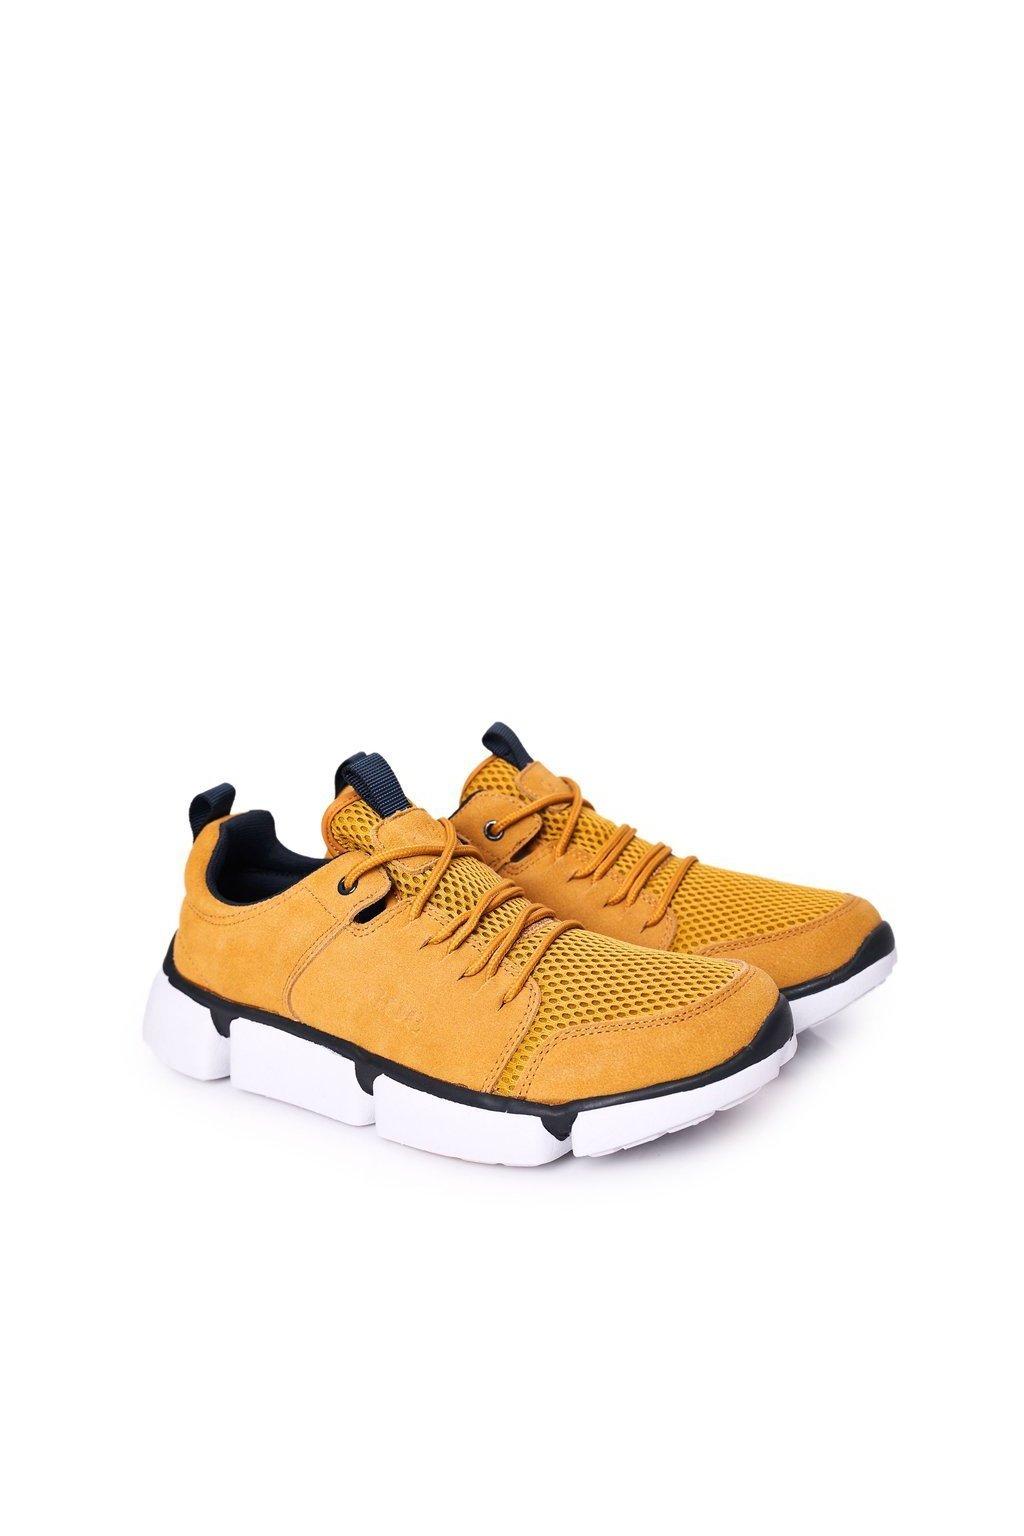 Žltá obuv kód topánok HH1N4029 YELLOW/NAVY